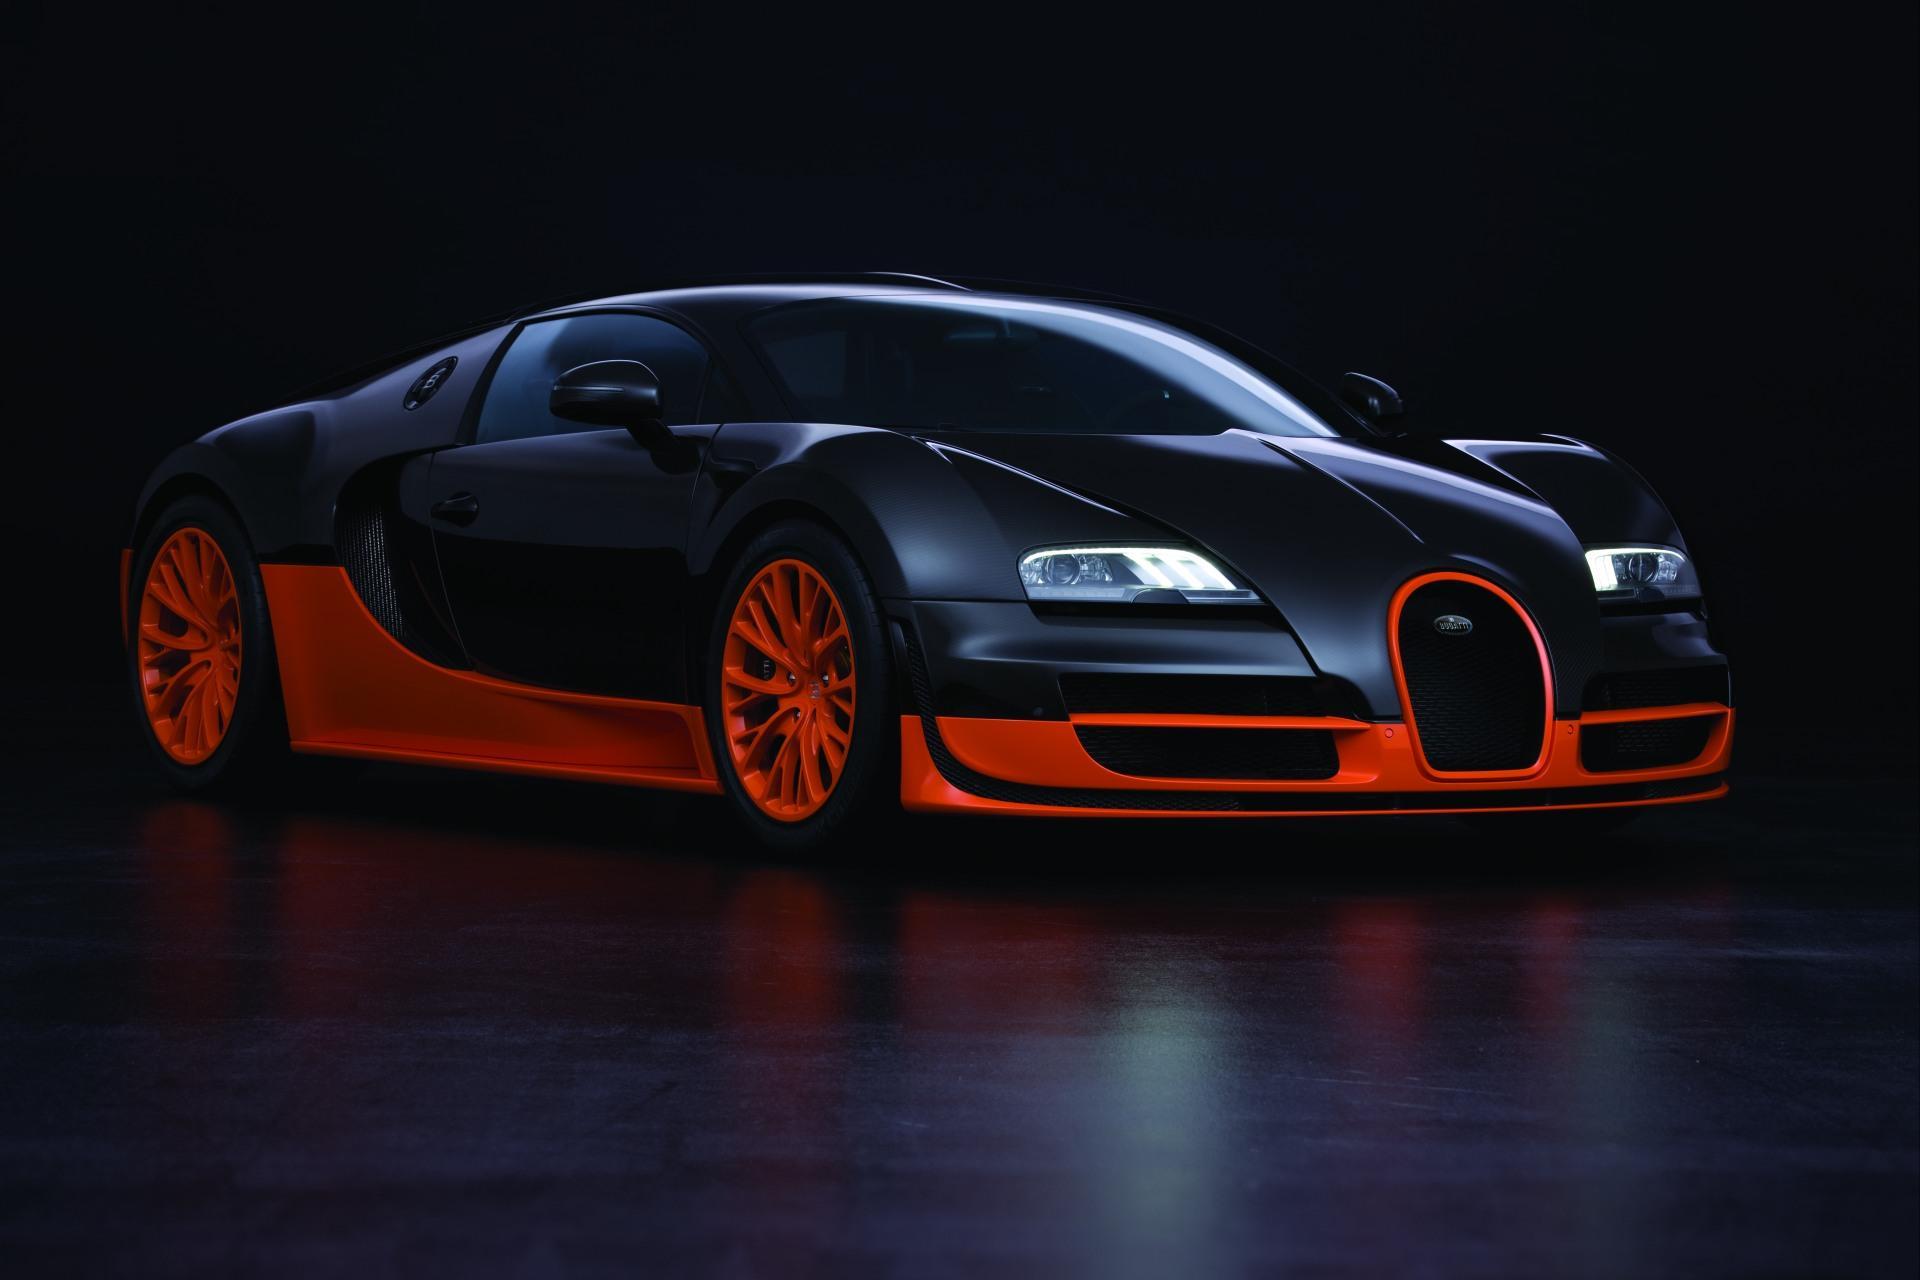 2010 Bugatti Super Sport